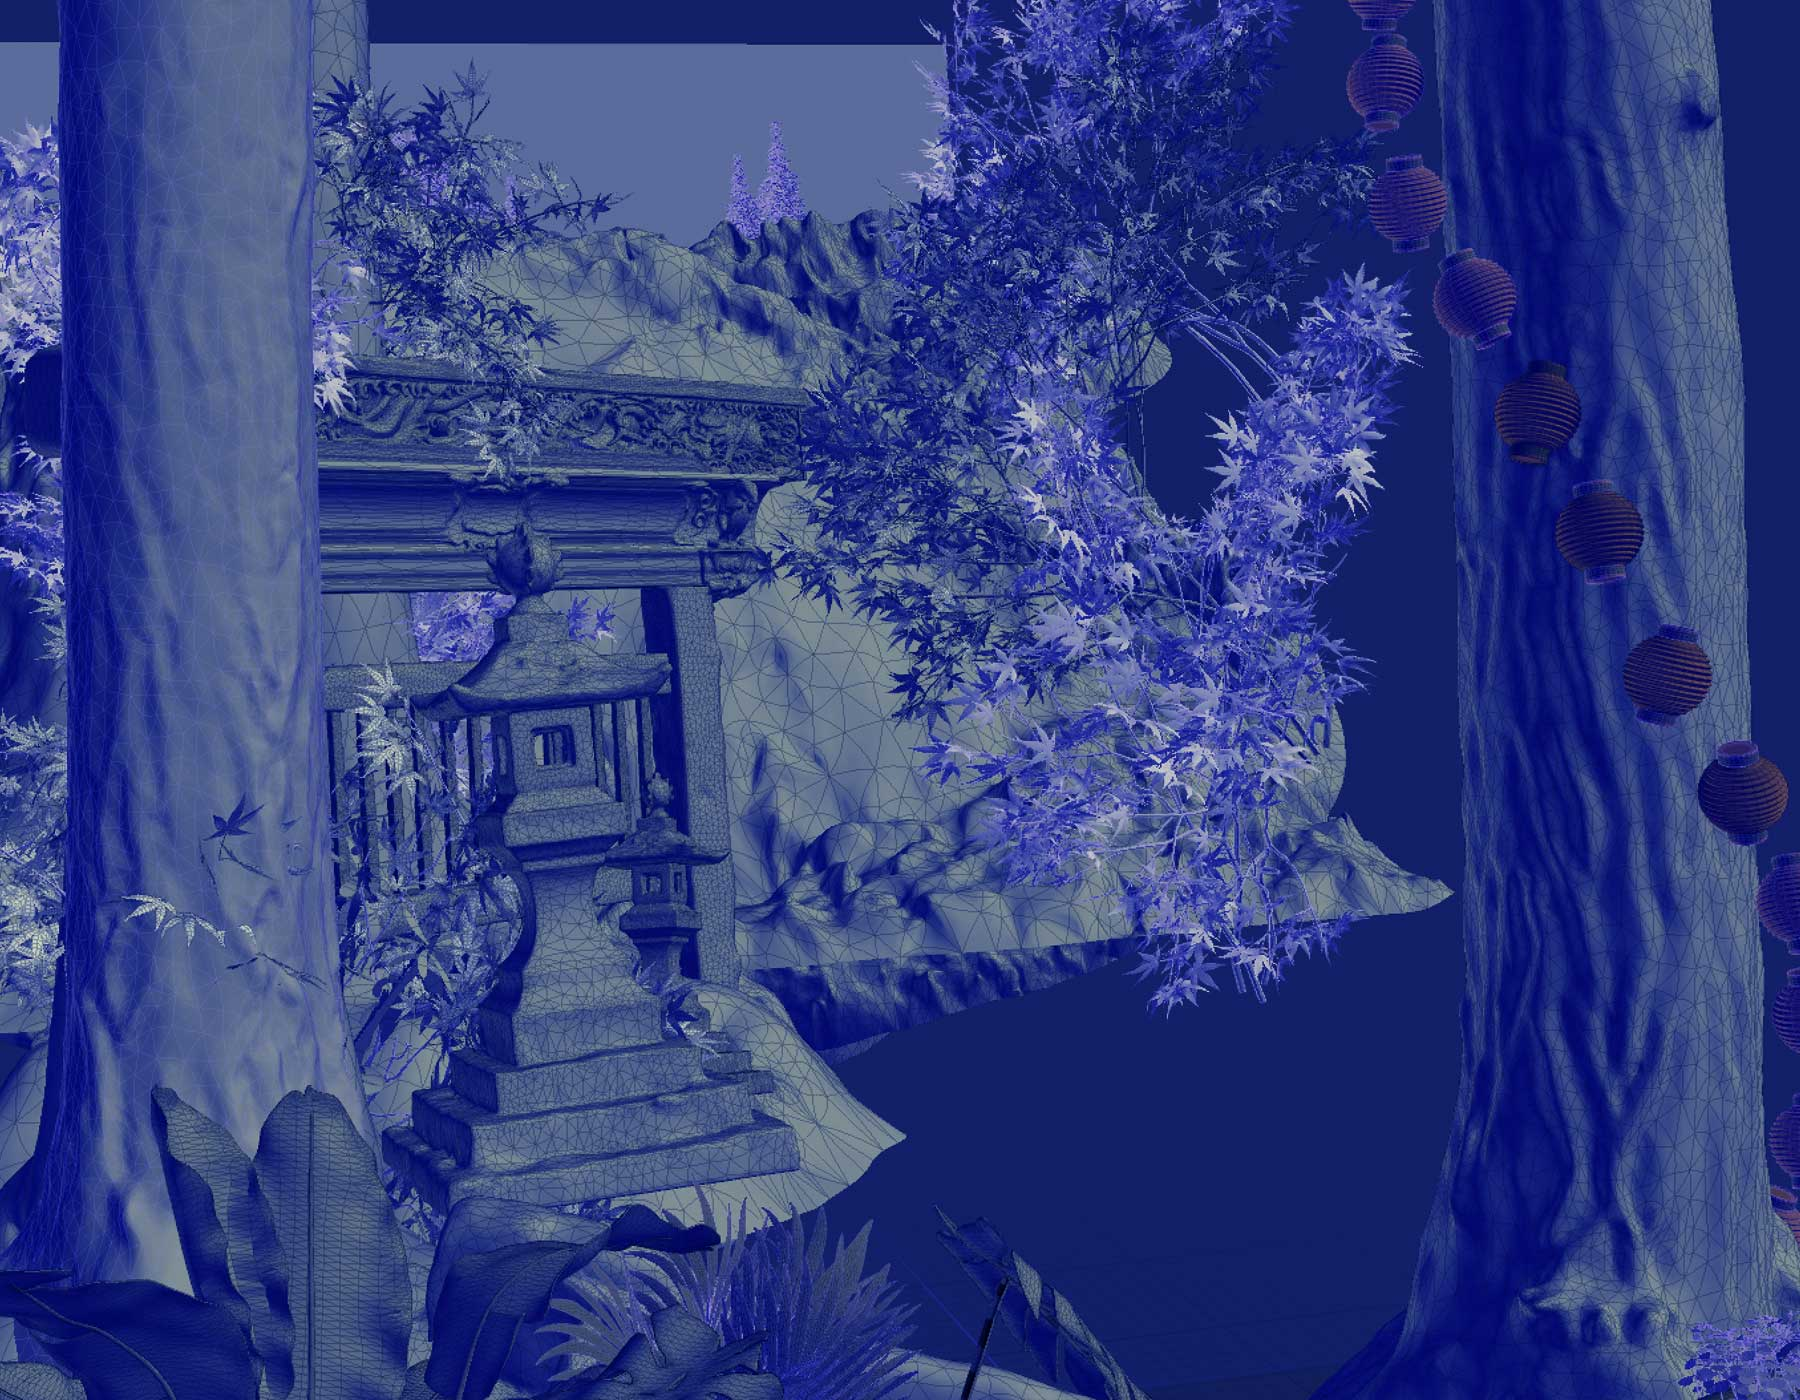 studio ghibli, my neighbor totoro, Johnnie Walker, Ngon, Manchester Agency, 3d artist